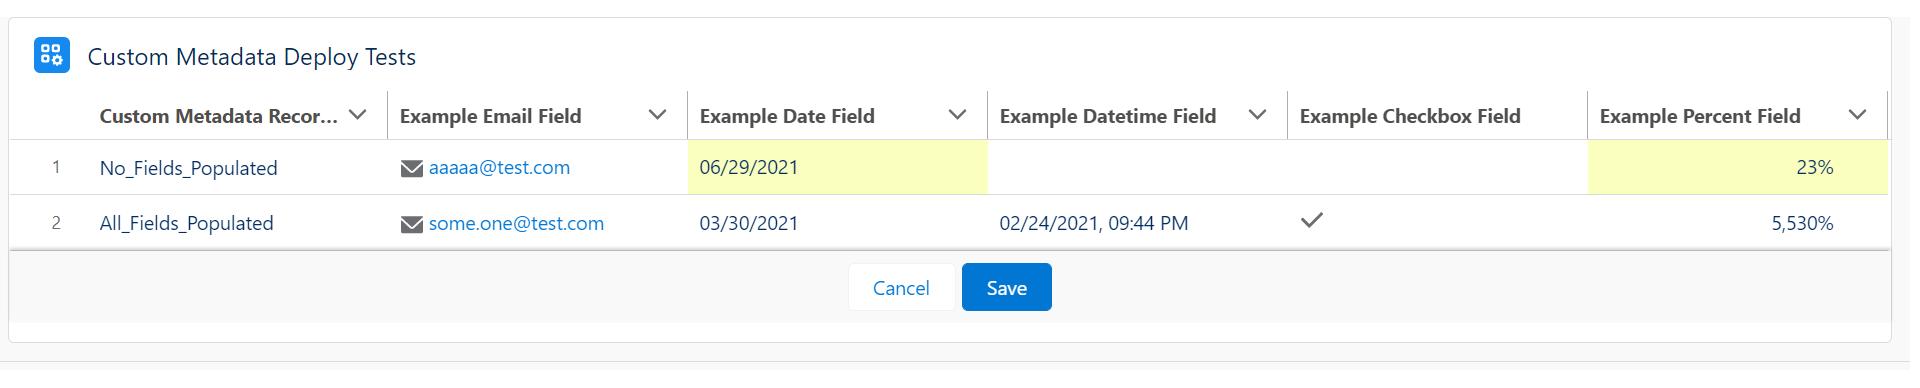 lwc-custom-metadata-table.png